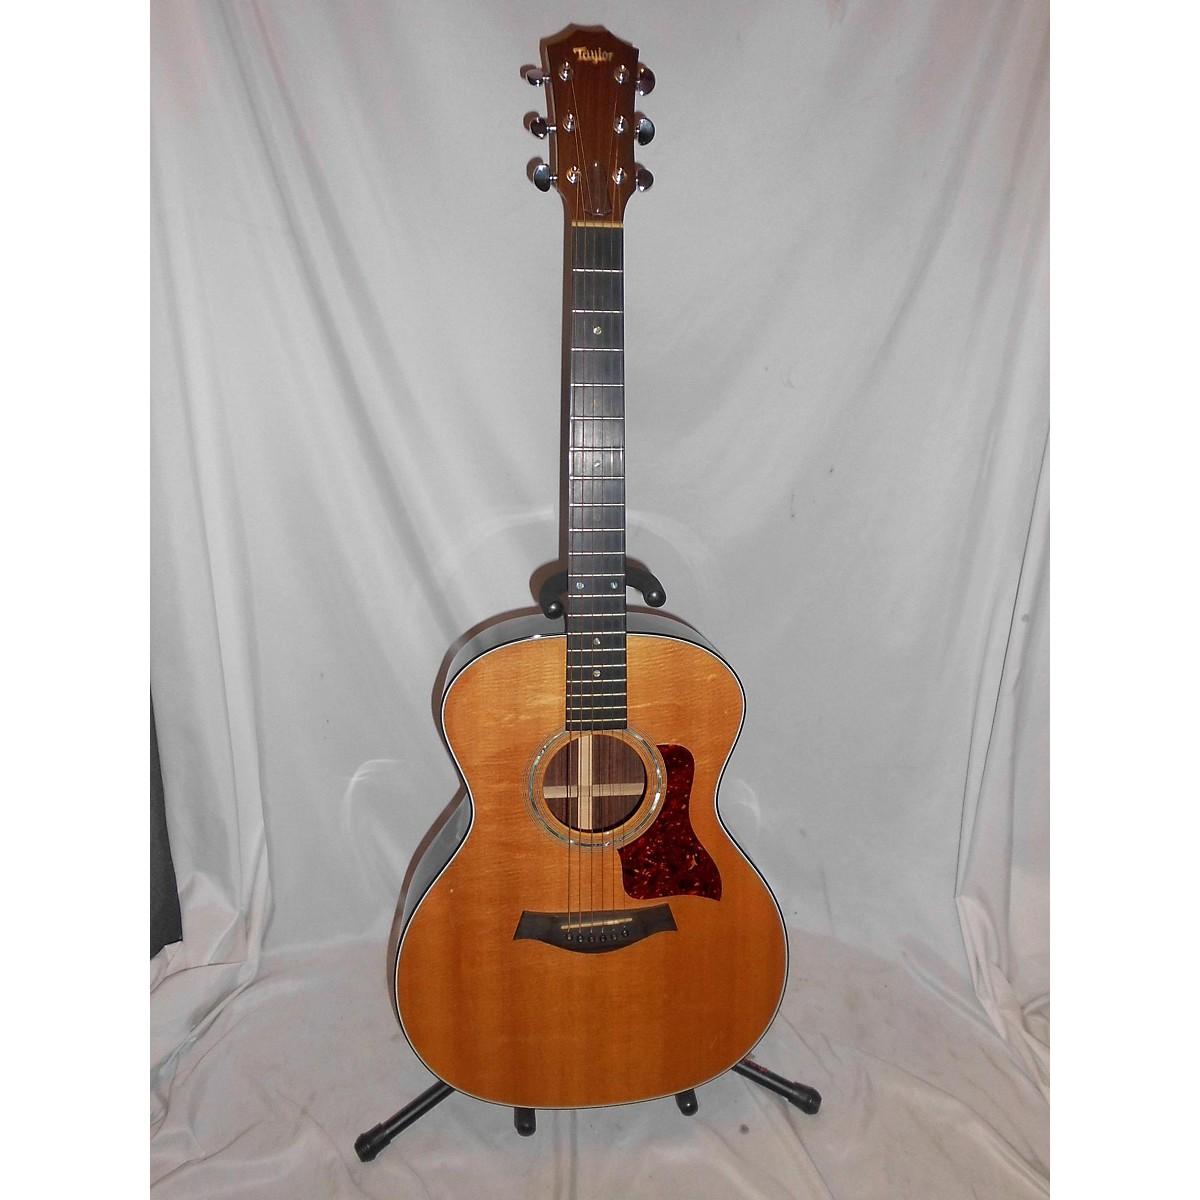 Taylor 714E Acoustic Electric Guitar